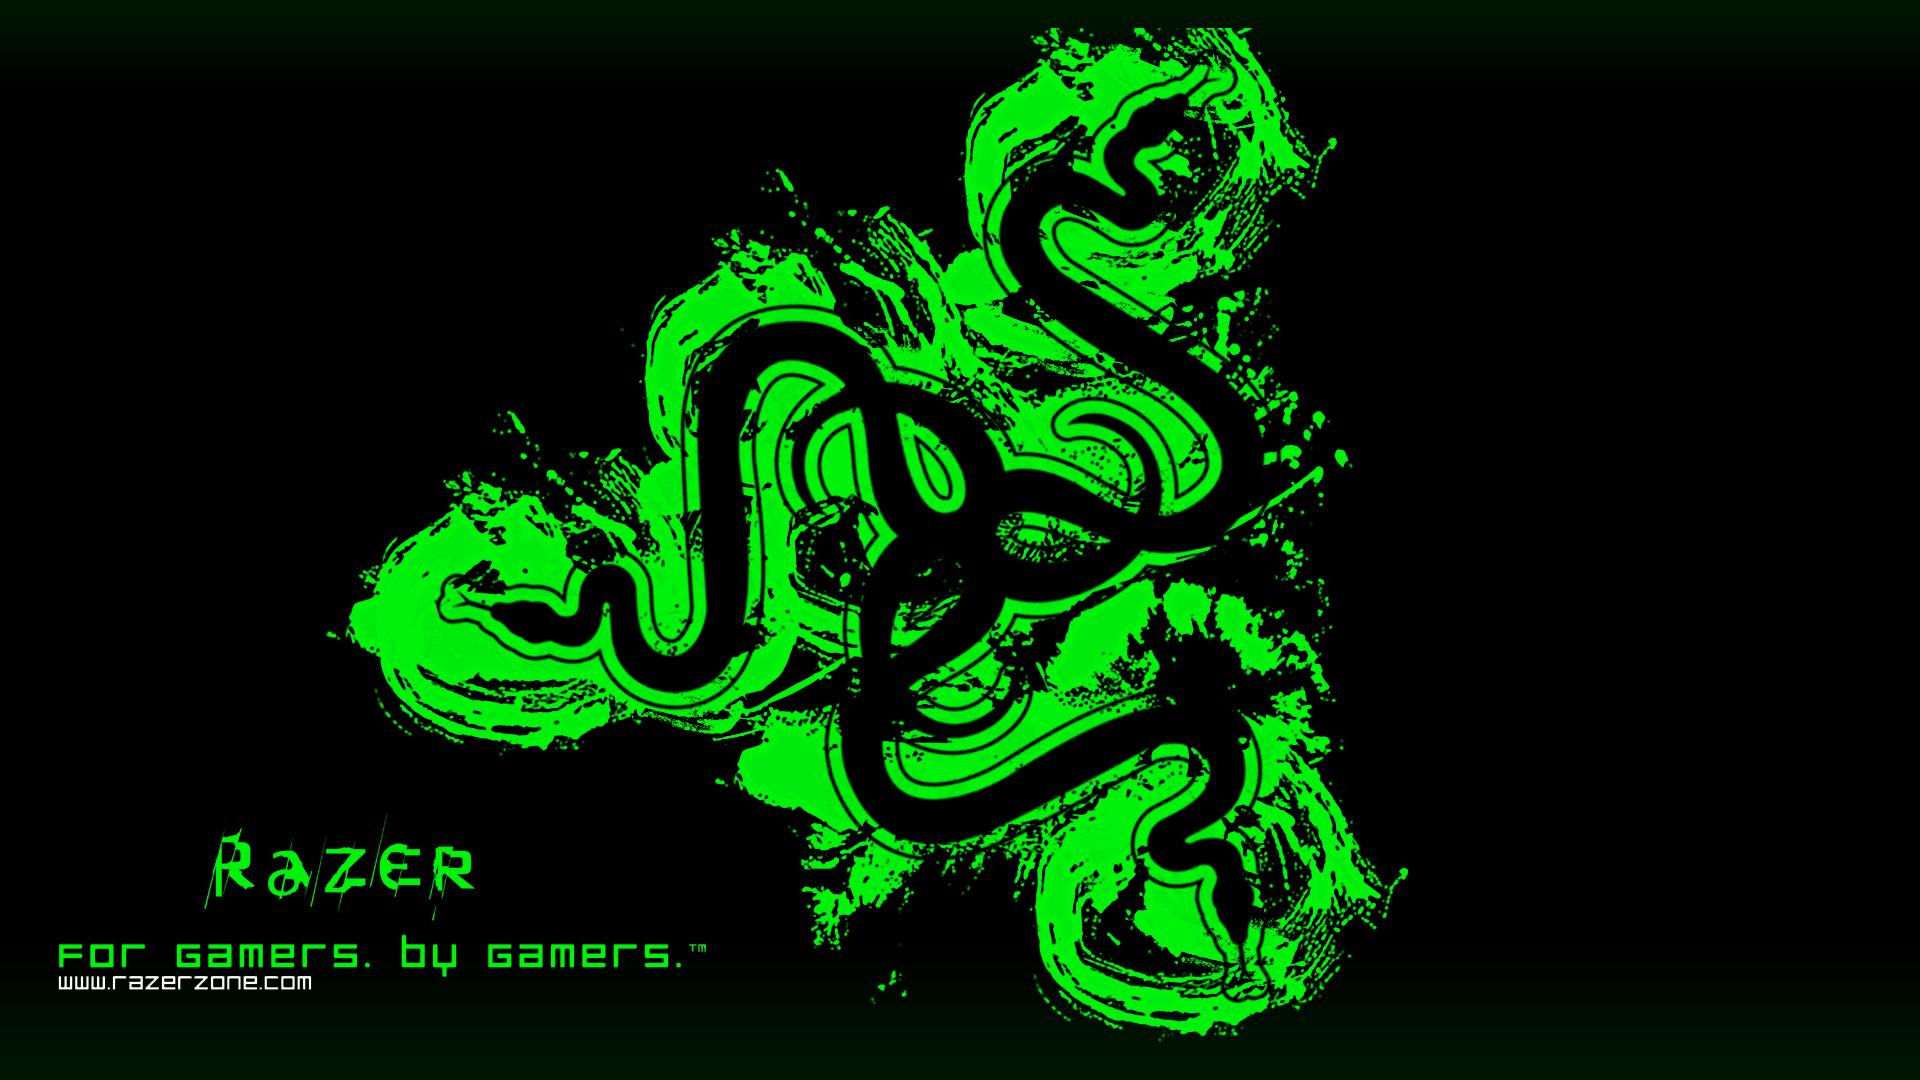 Razer Gaming Wallpapers 1920x1080